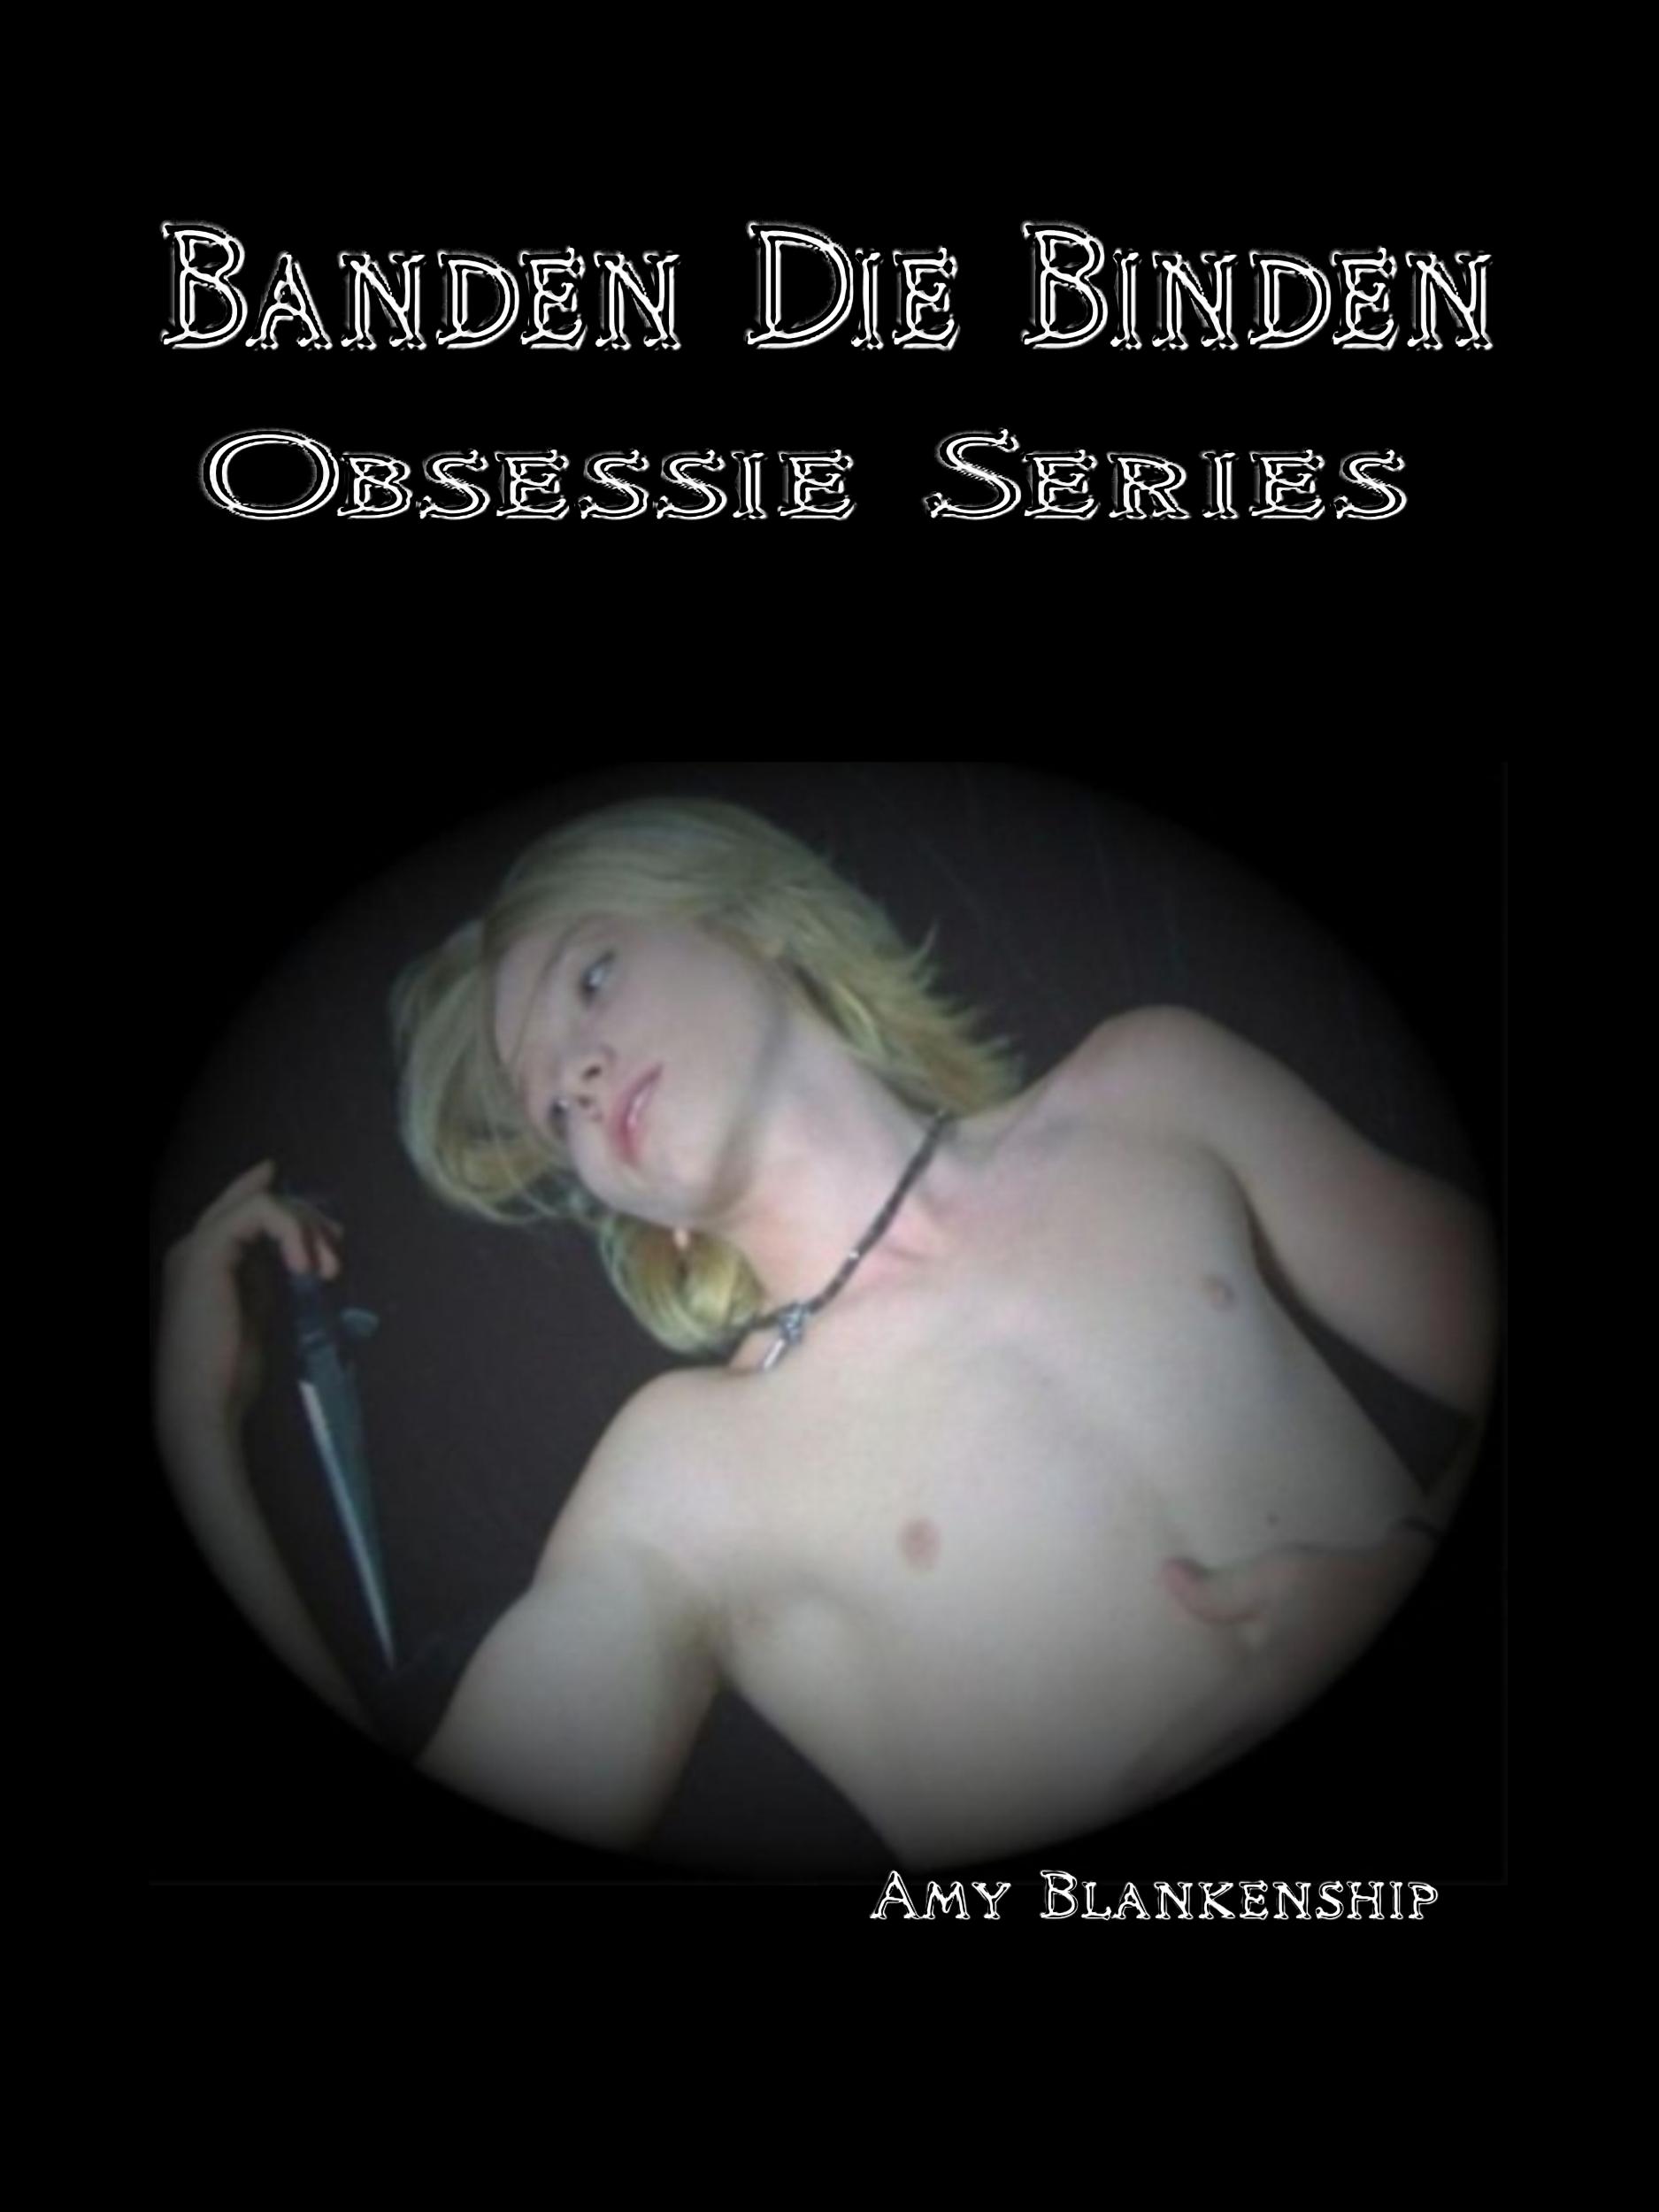 цена на Amy Blankenship Banden Die Binden